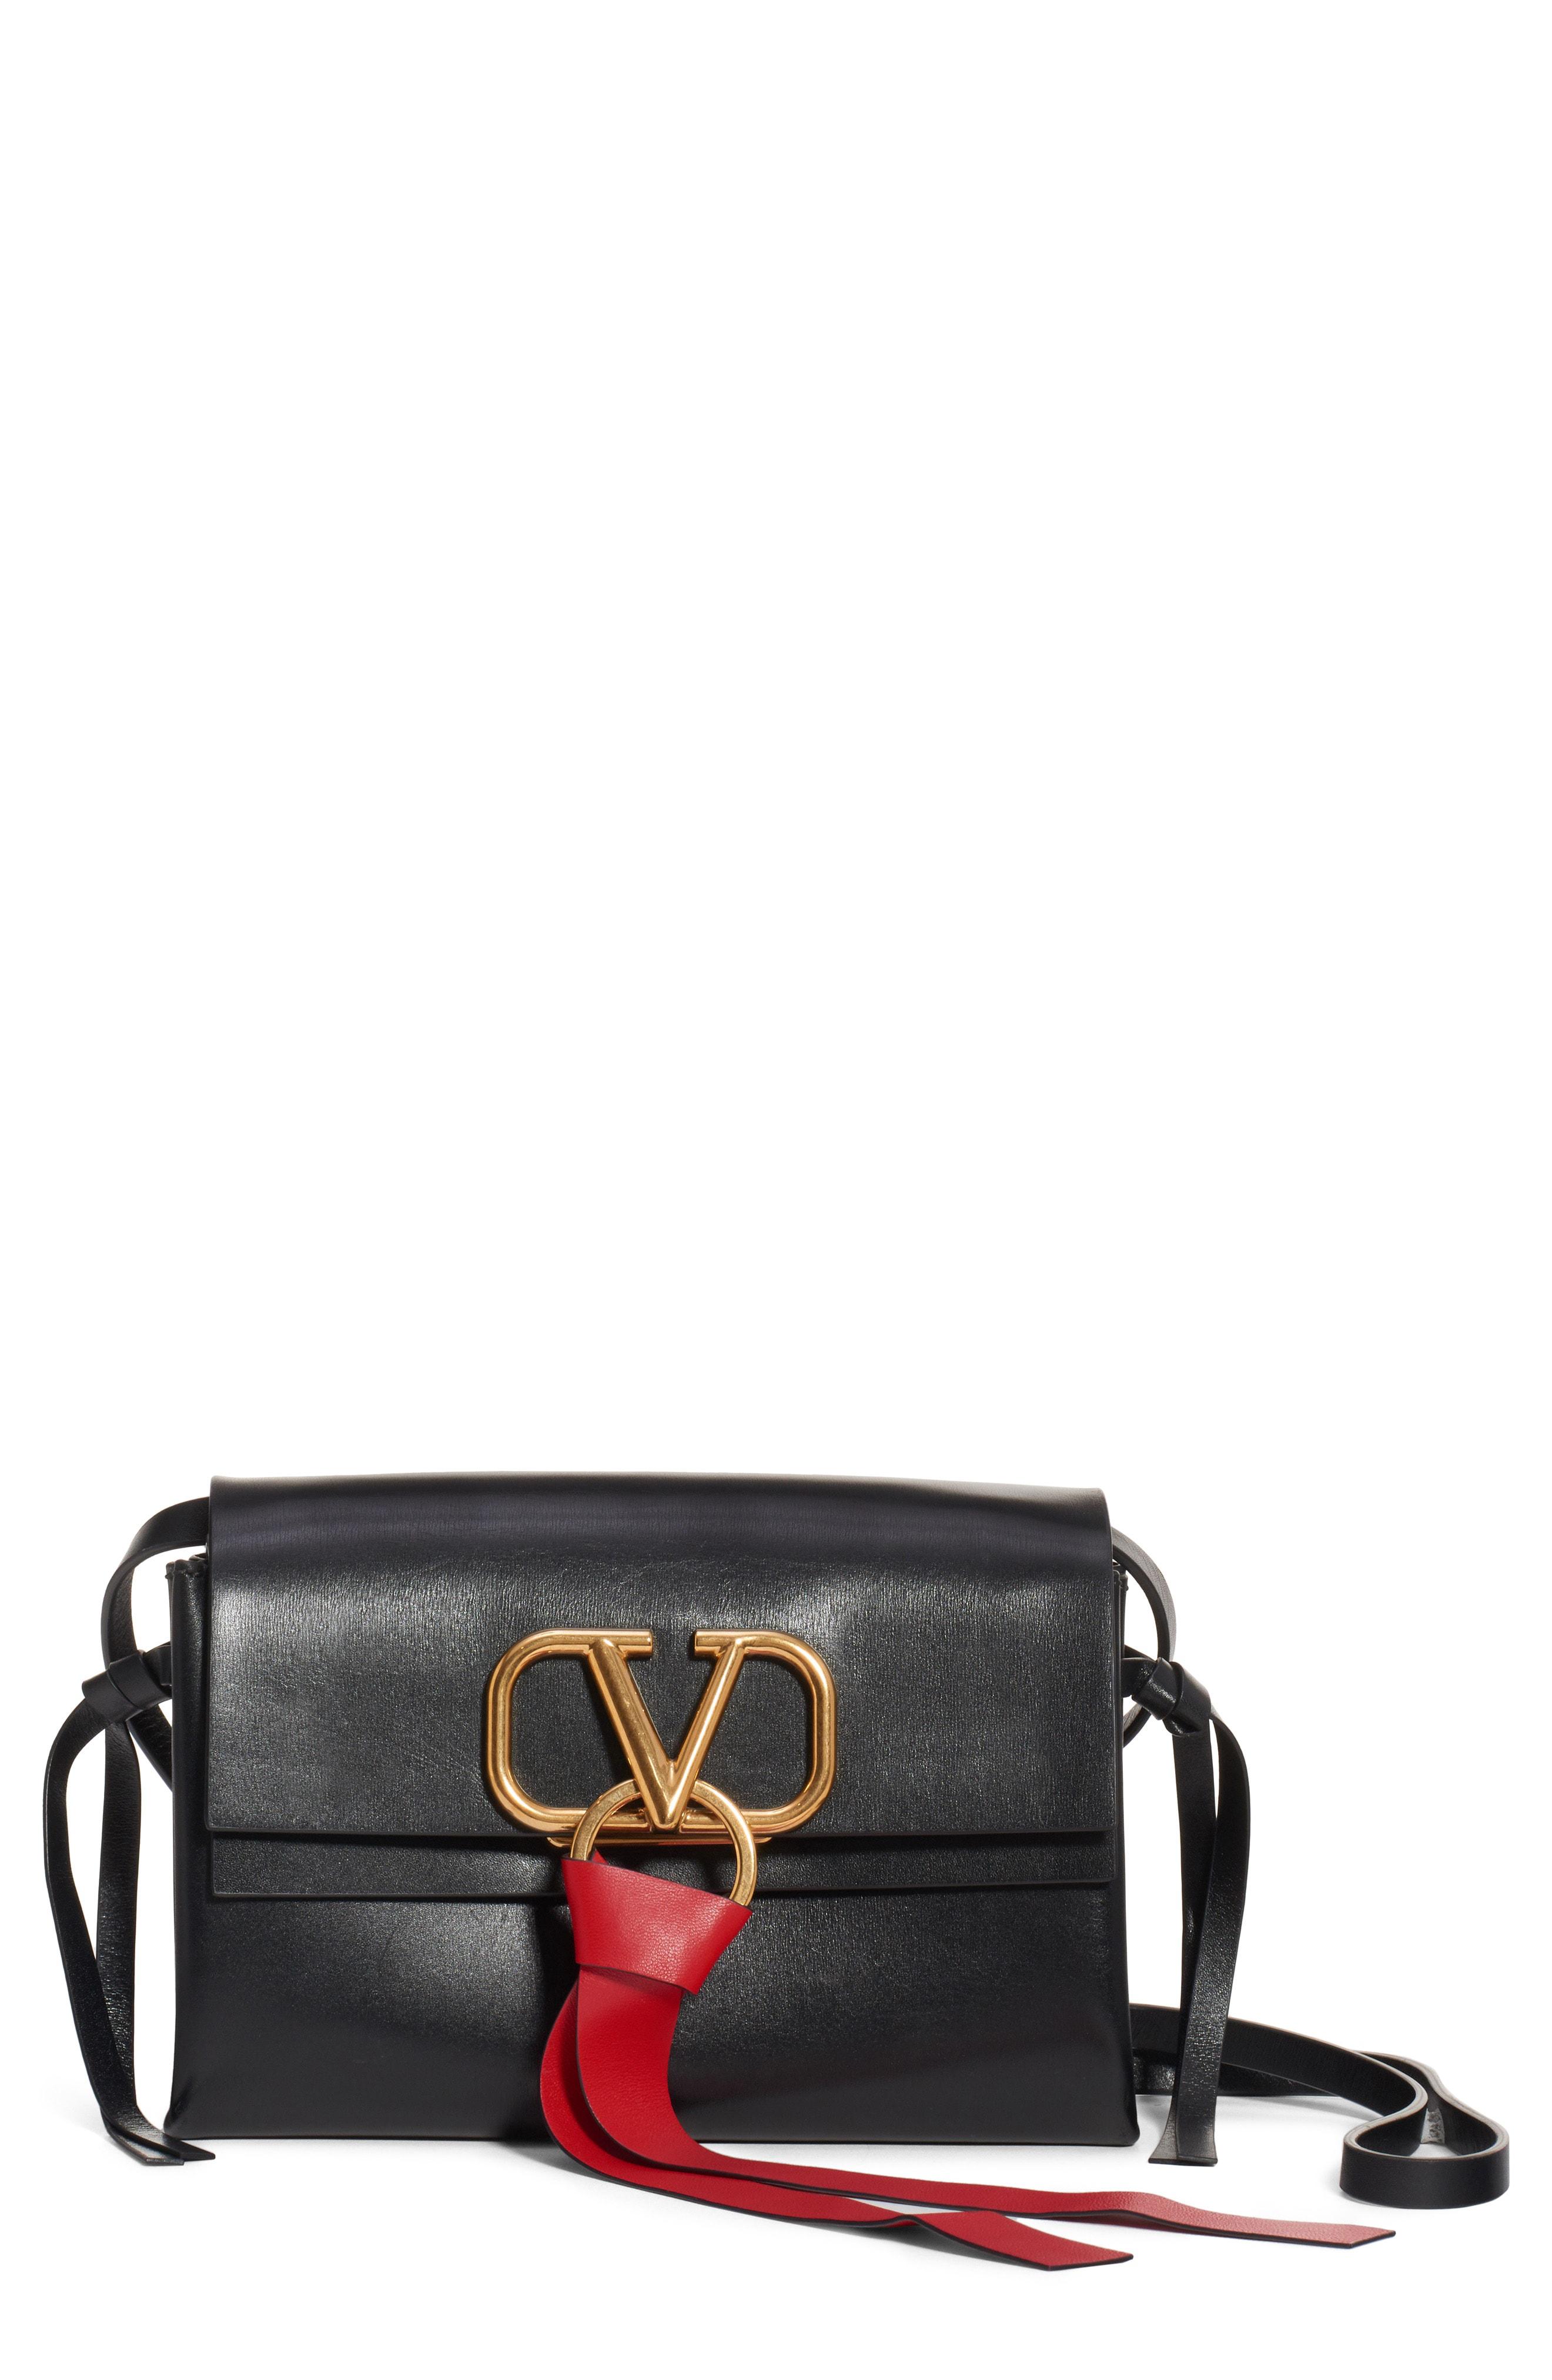 73cdcdb7ee91a Valentino V-Ring Leather Crossbody Bag - Black In Nero-Nero  Nero ...